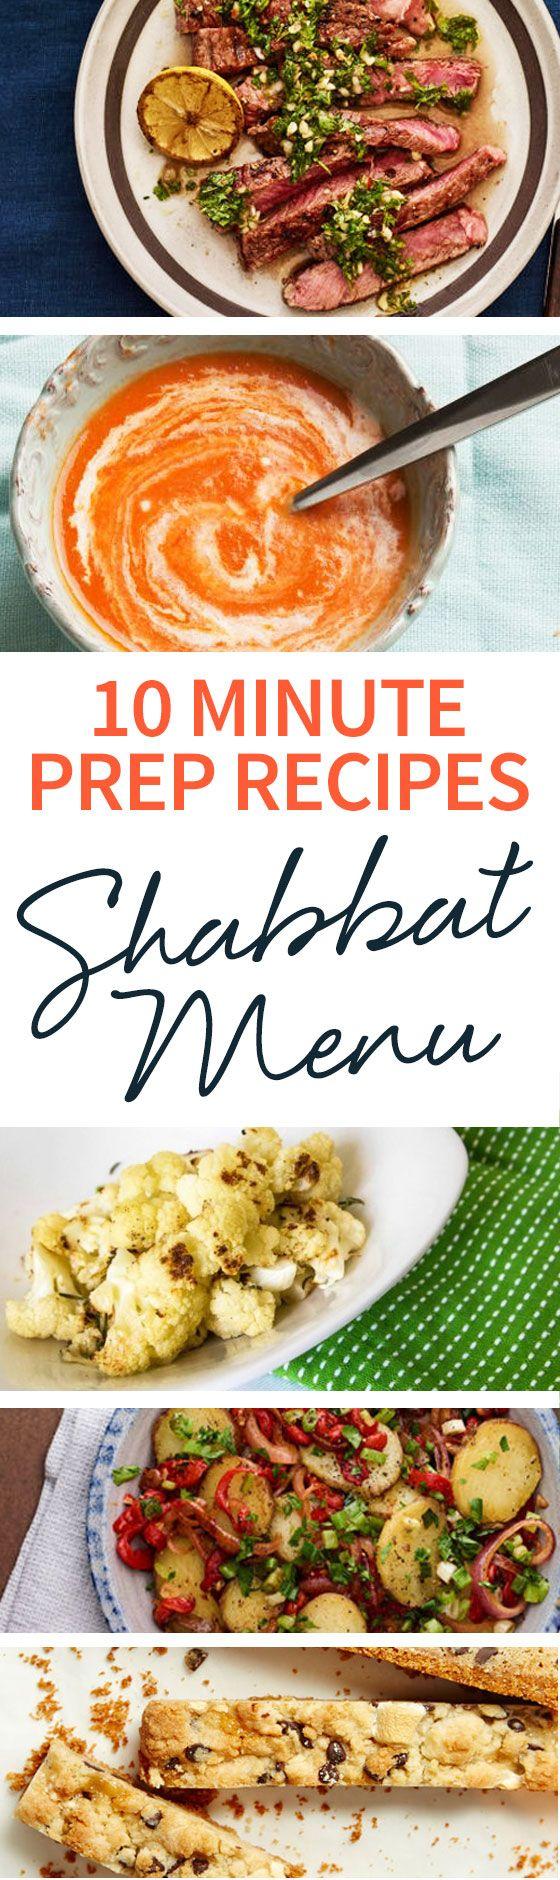 Find inspiration for your Shabbat meal when you follow our 10 Minute Prep Recipes Shabbat Menu guide! http://www.joyofkosher.com/2017/02/10-minute-prep-recipes-shabbat-menu/